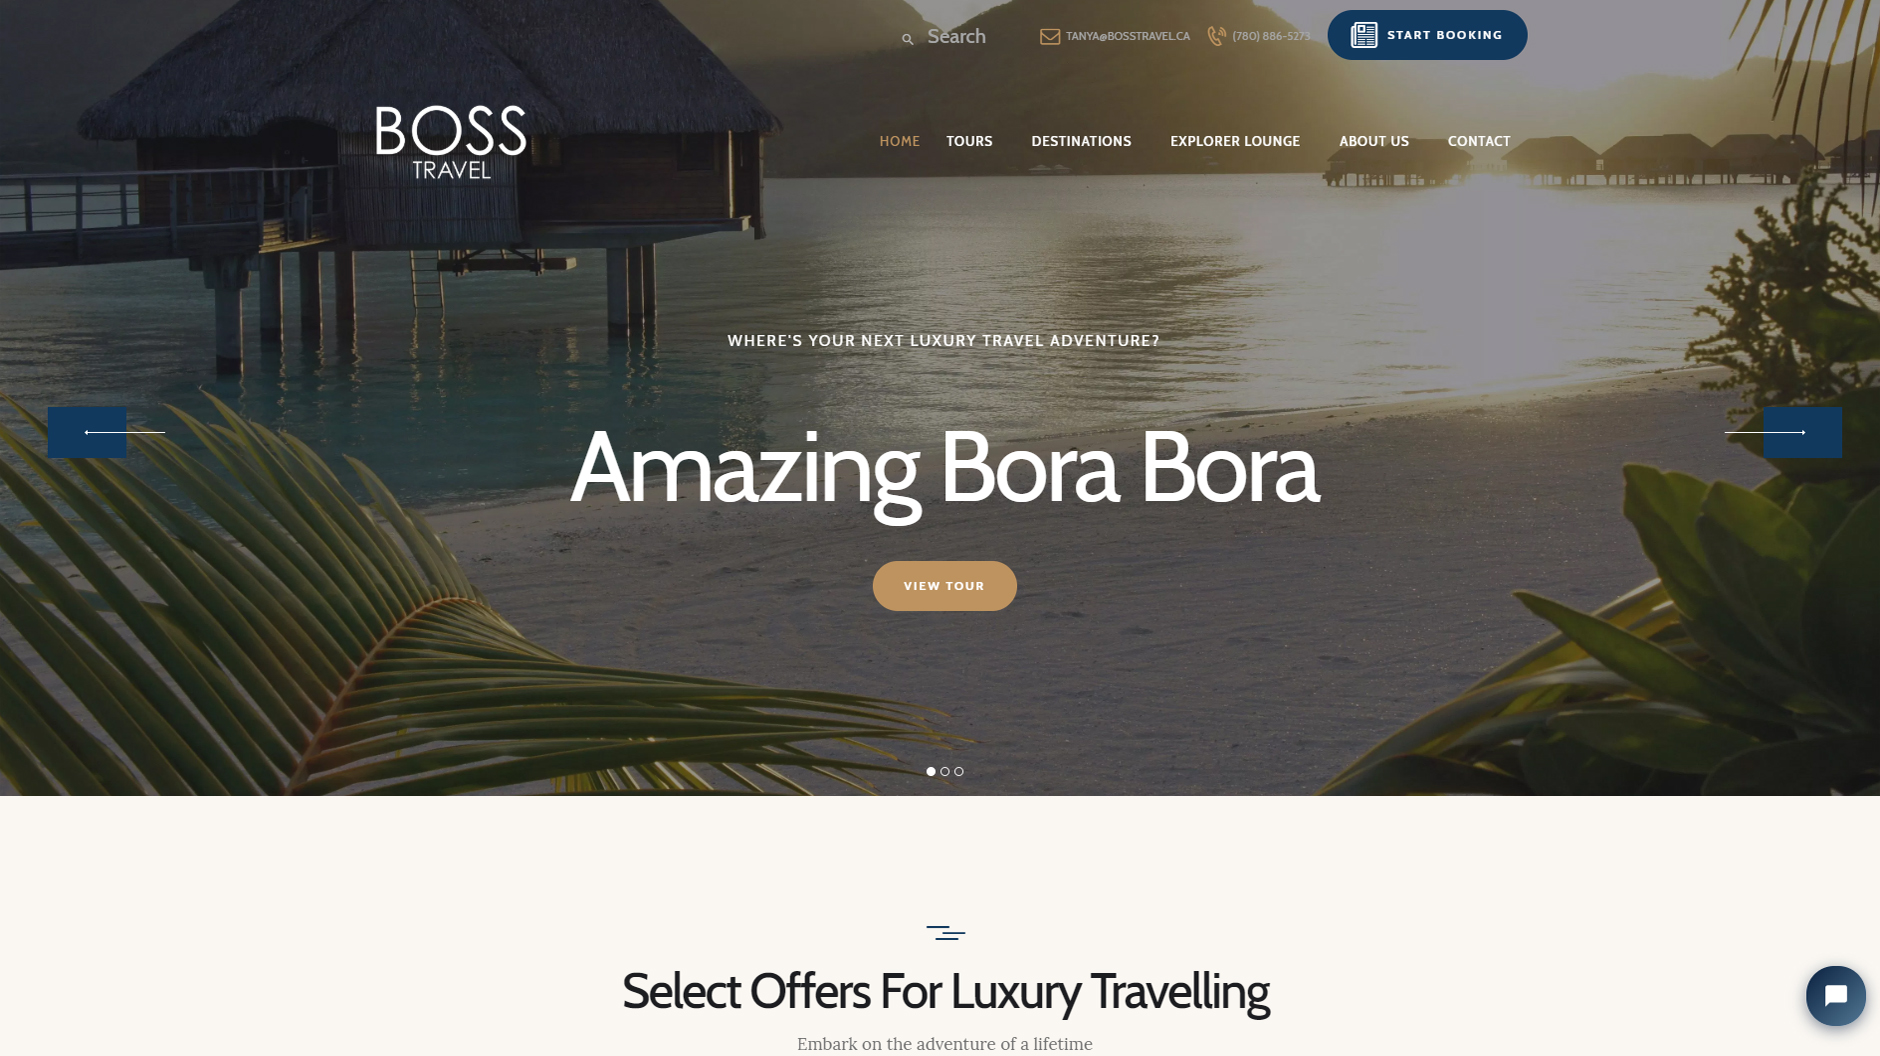 BOSS Travel